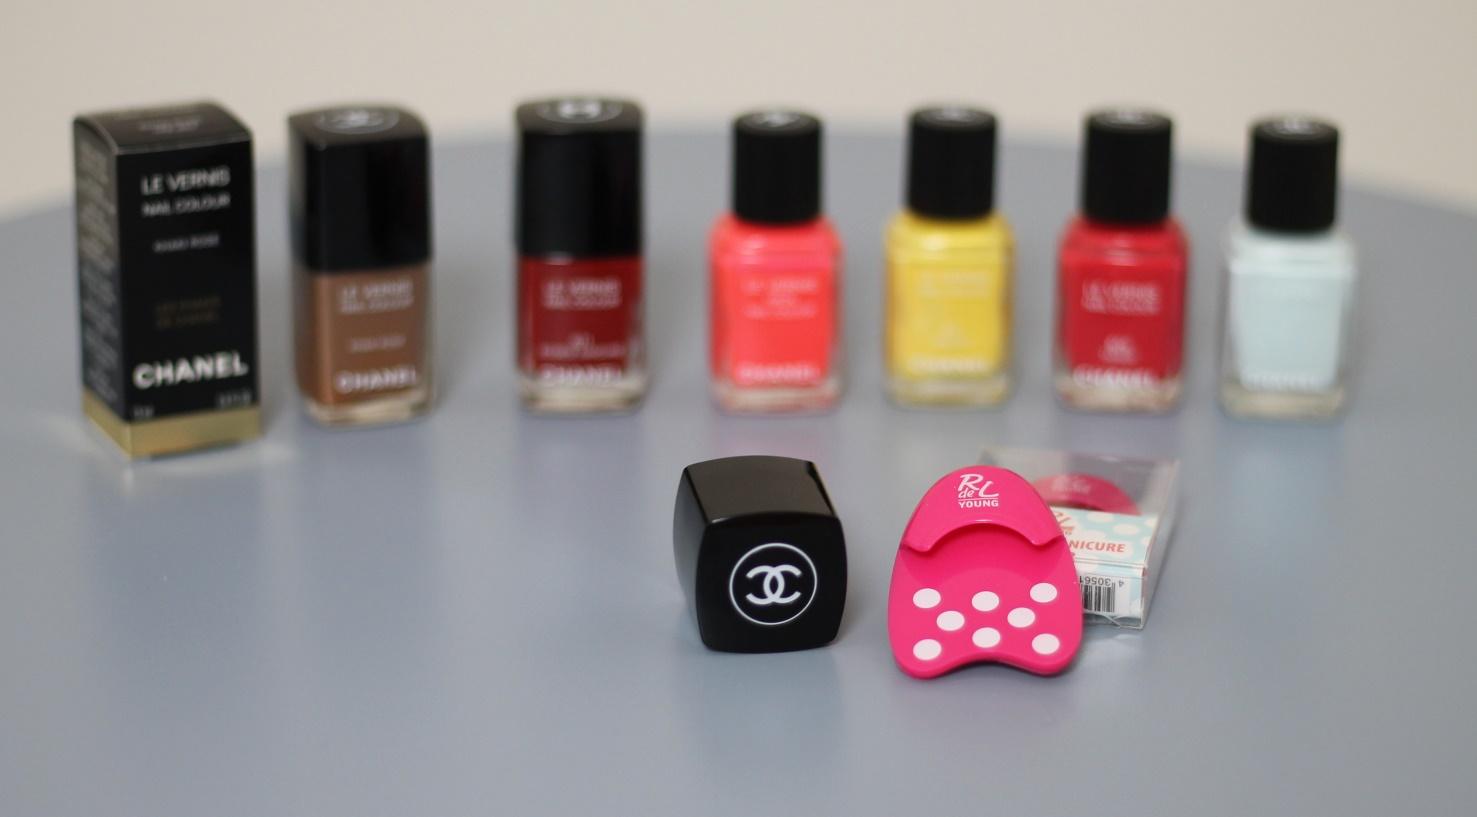 chanel le vernis manicure beautyneuheiten